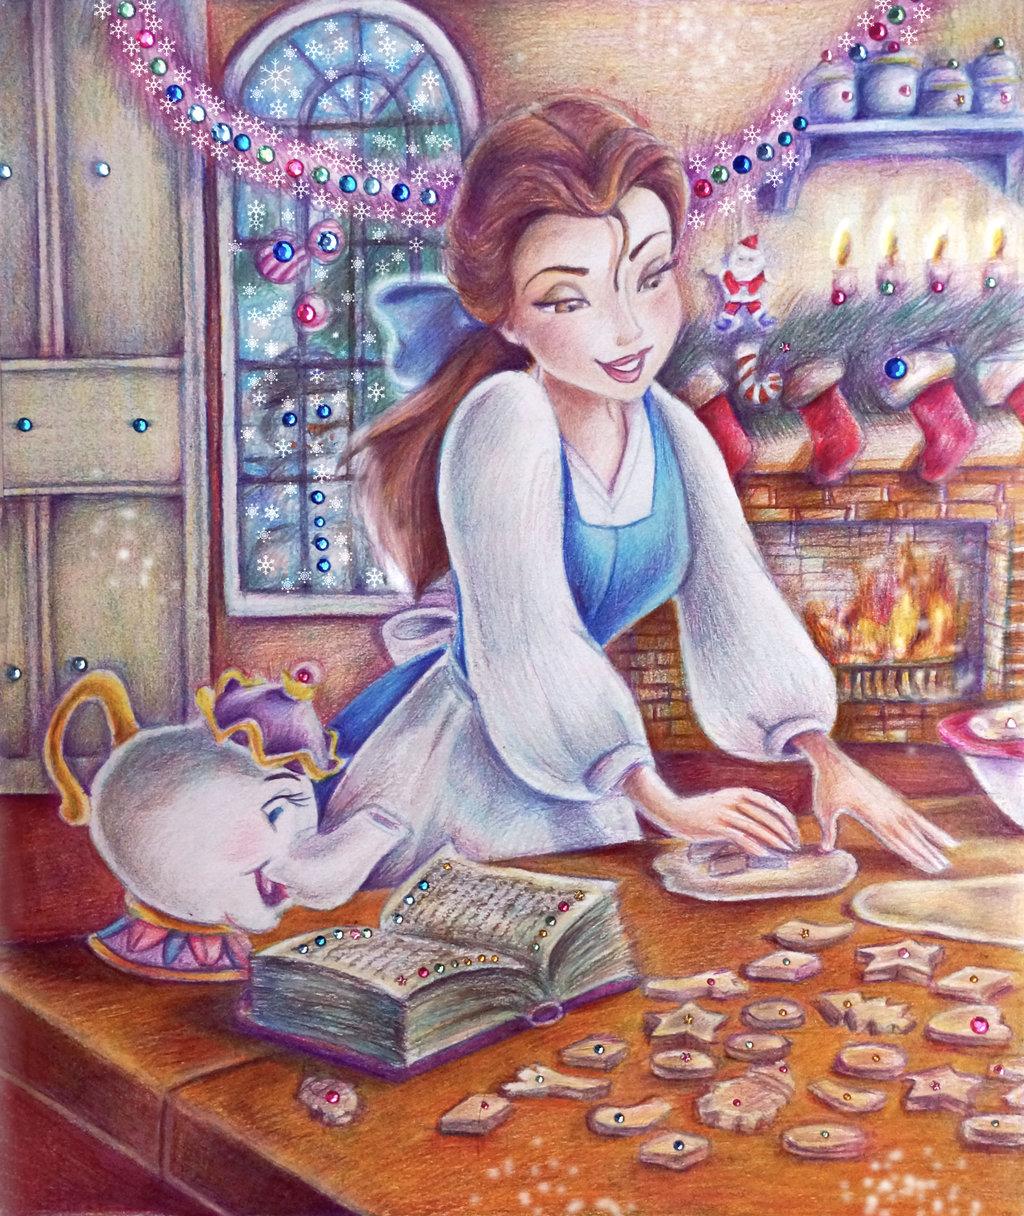 belle__christmas_cookie__by_alena_koshkar-d86pweg